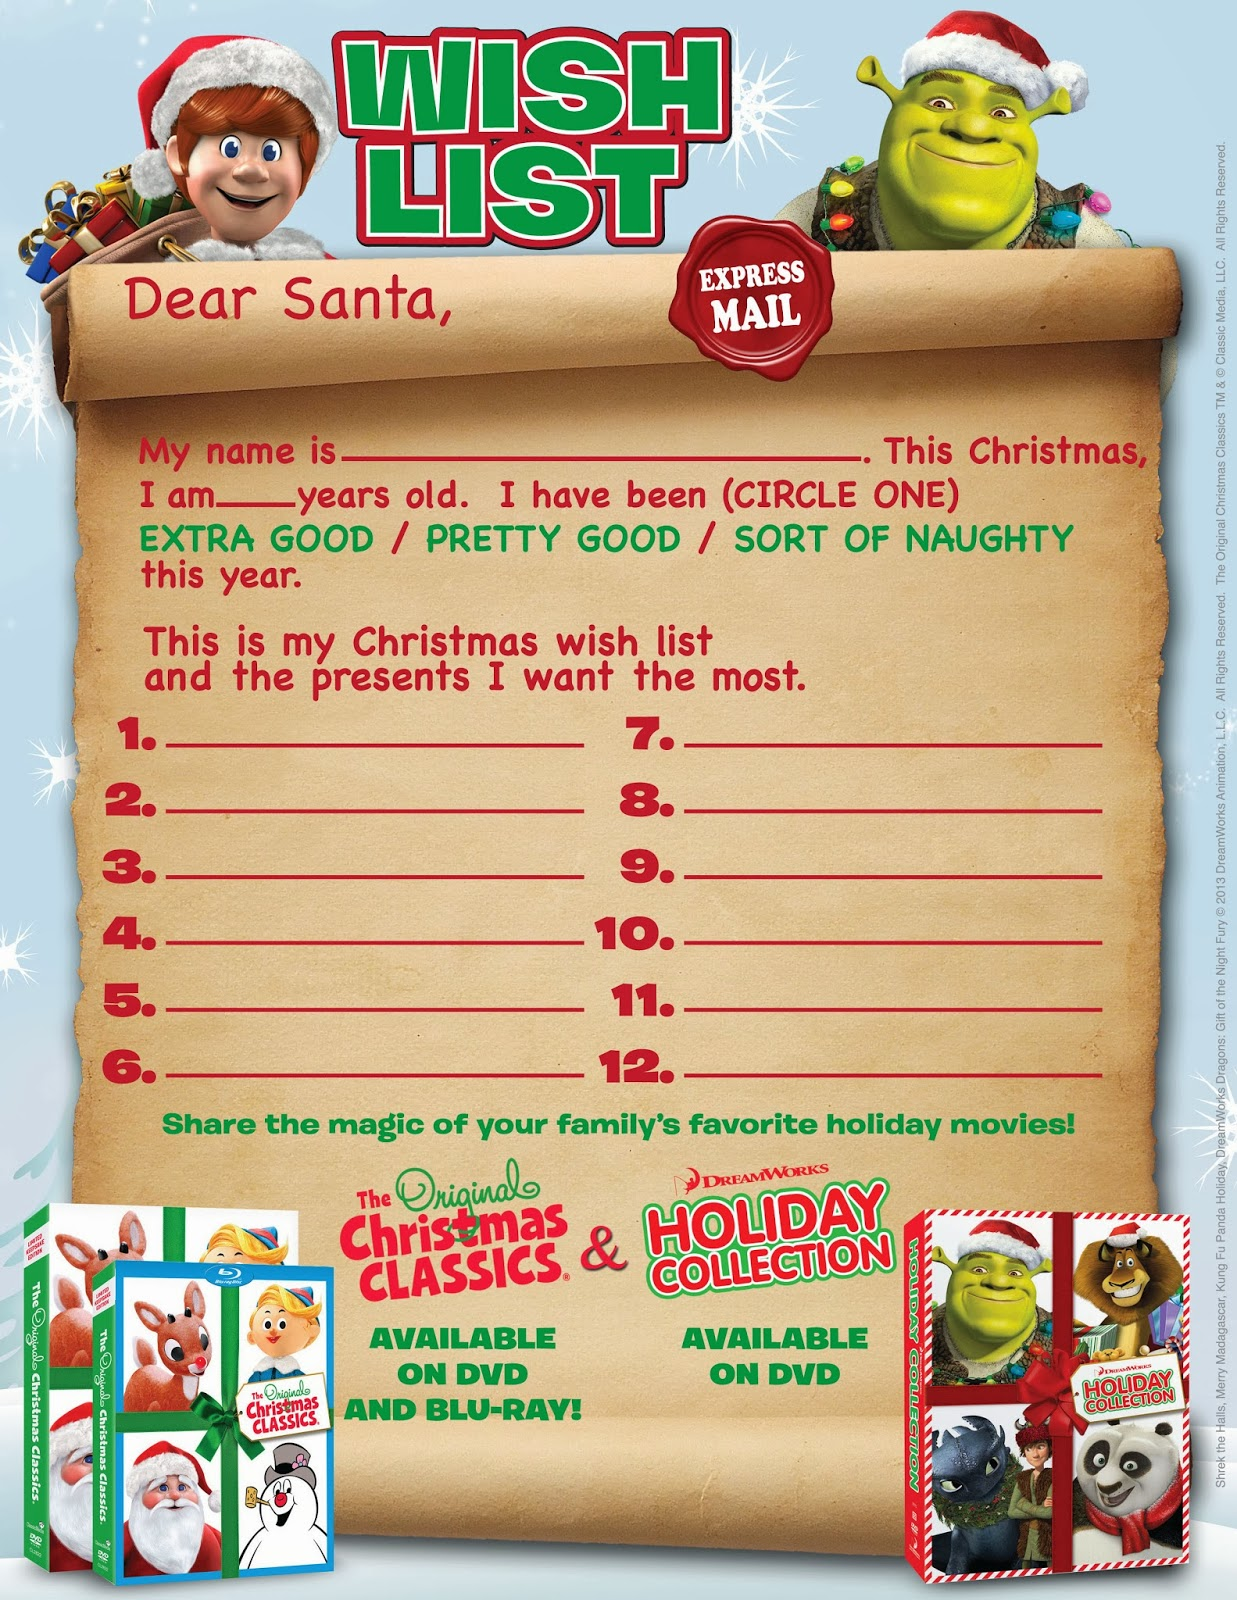 Printable Secret Santa Wish Lists Can send their wish list